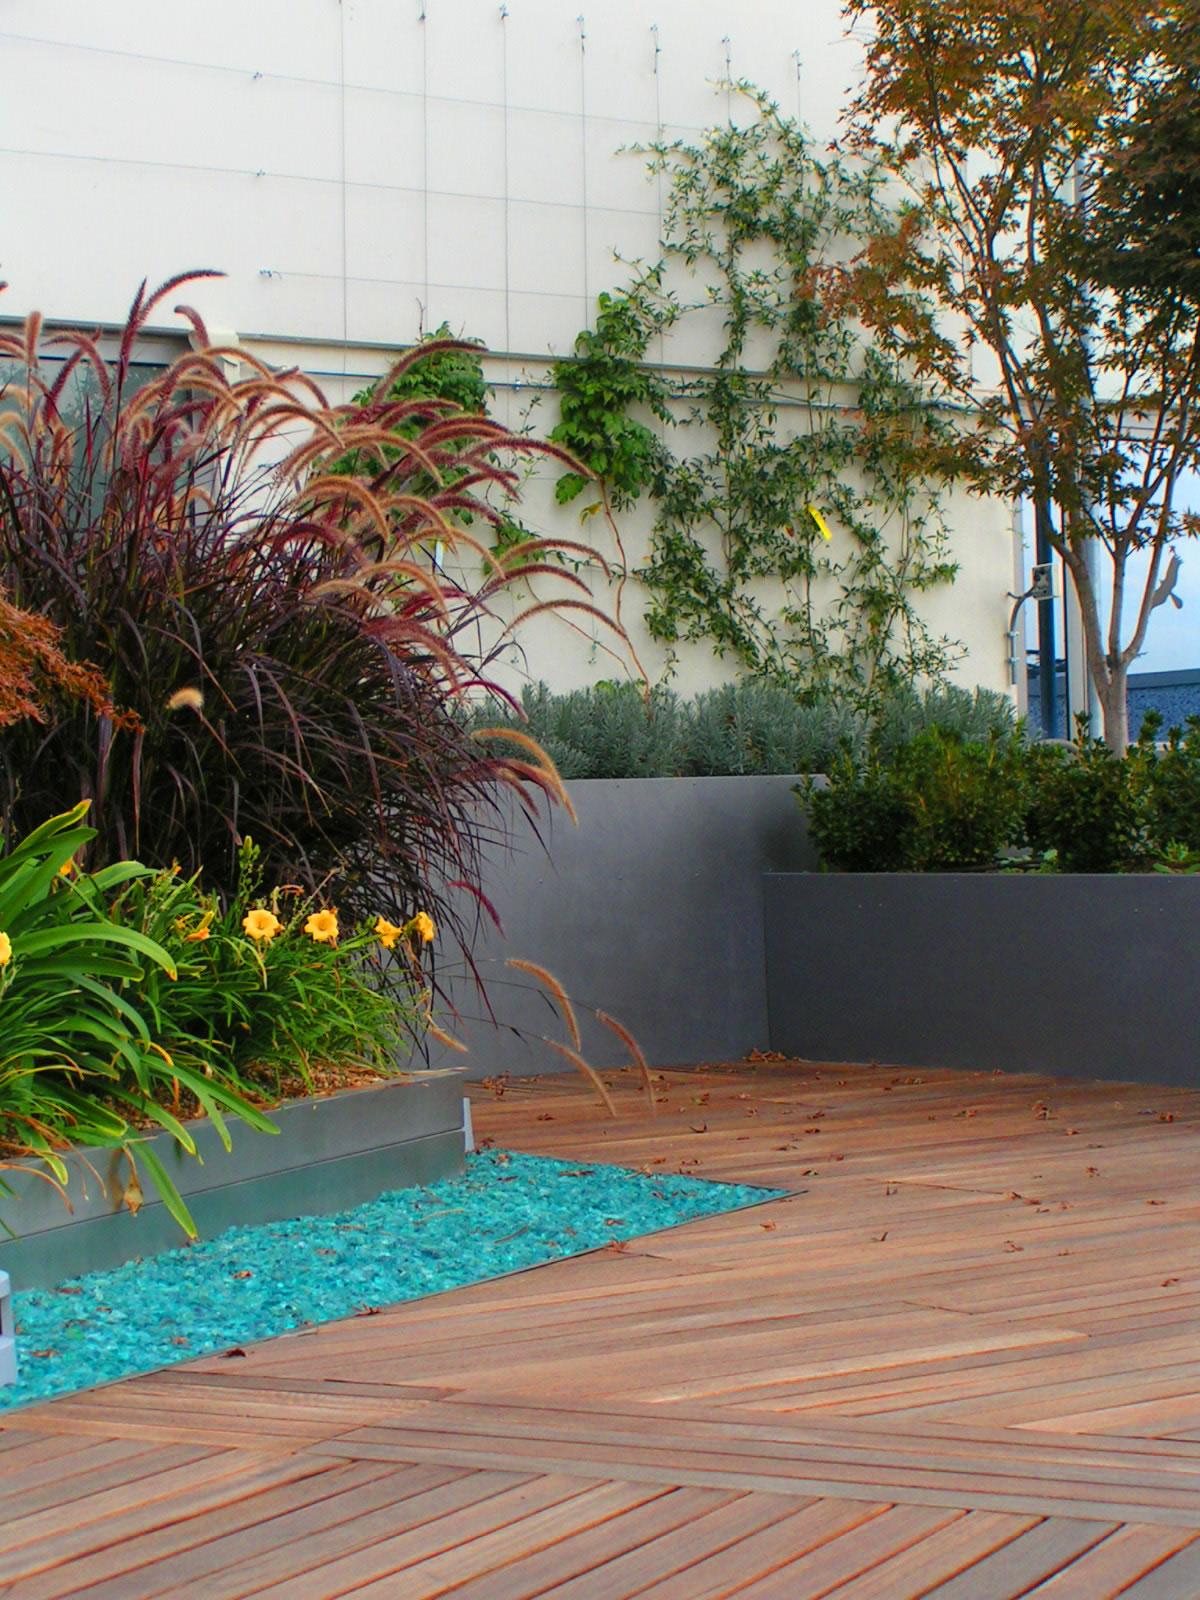 In Legno Wood Design wood, glass and steel | ghezzi garden design